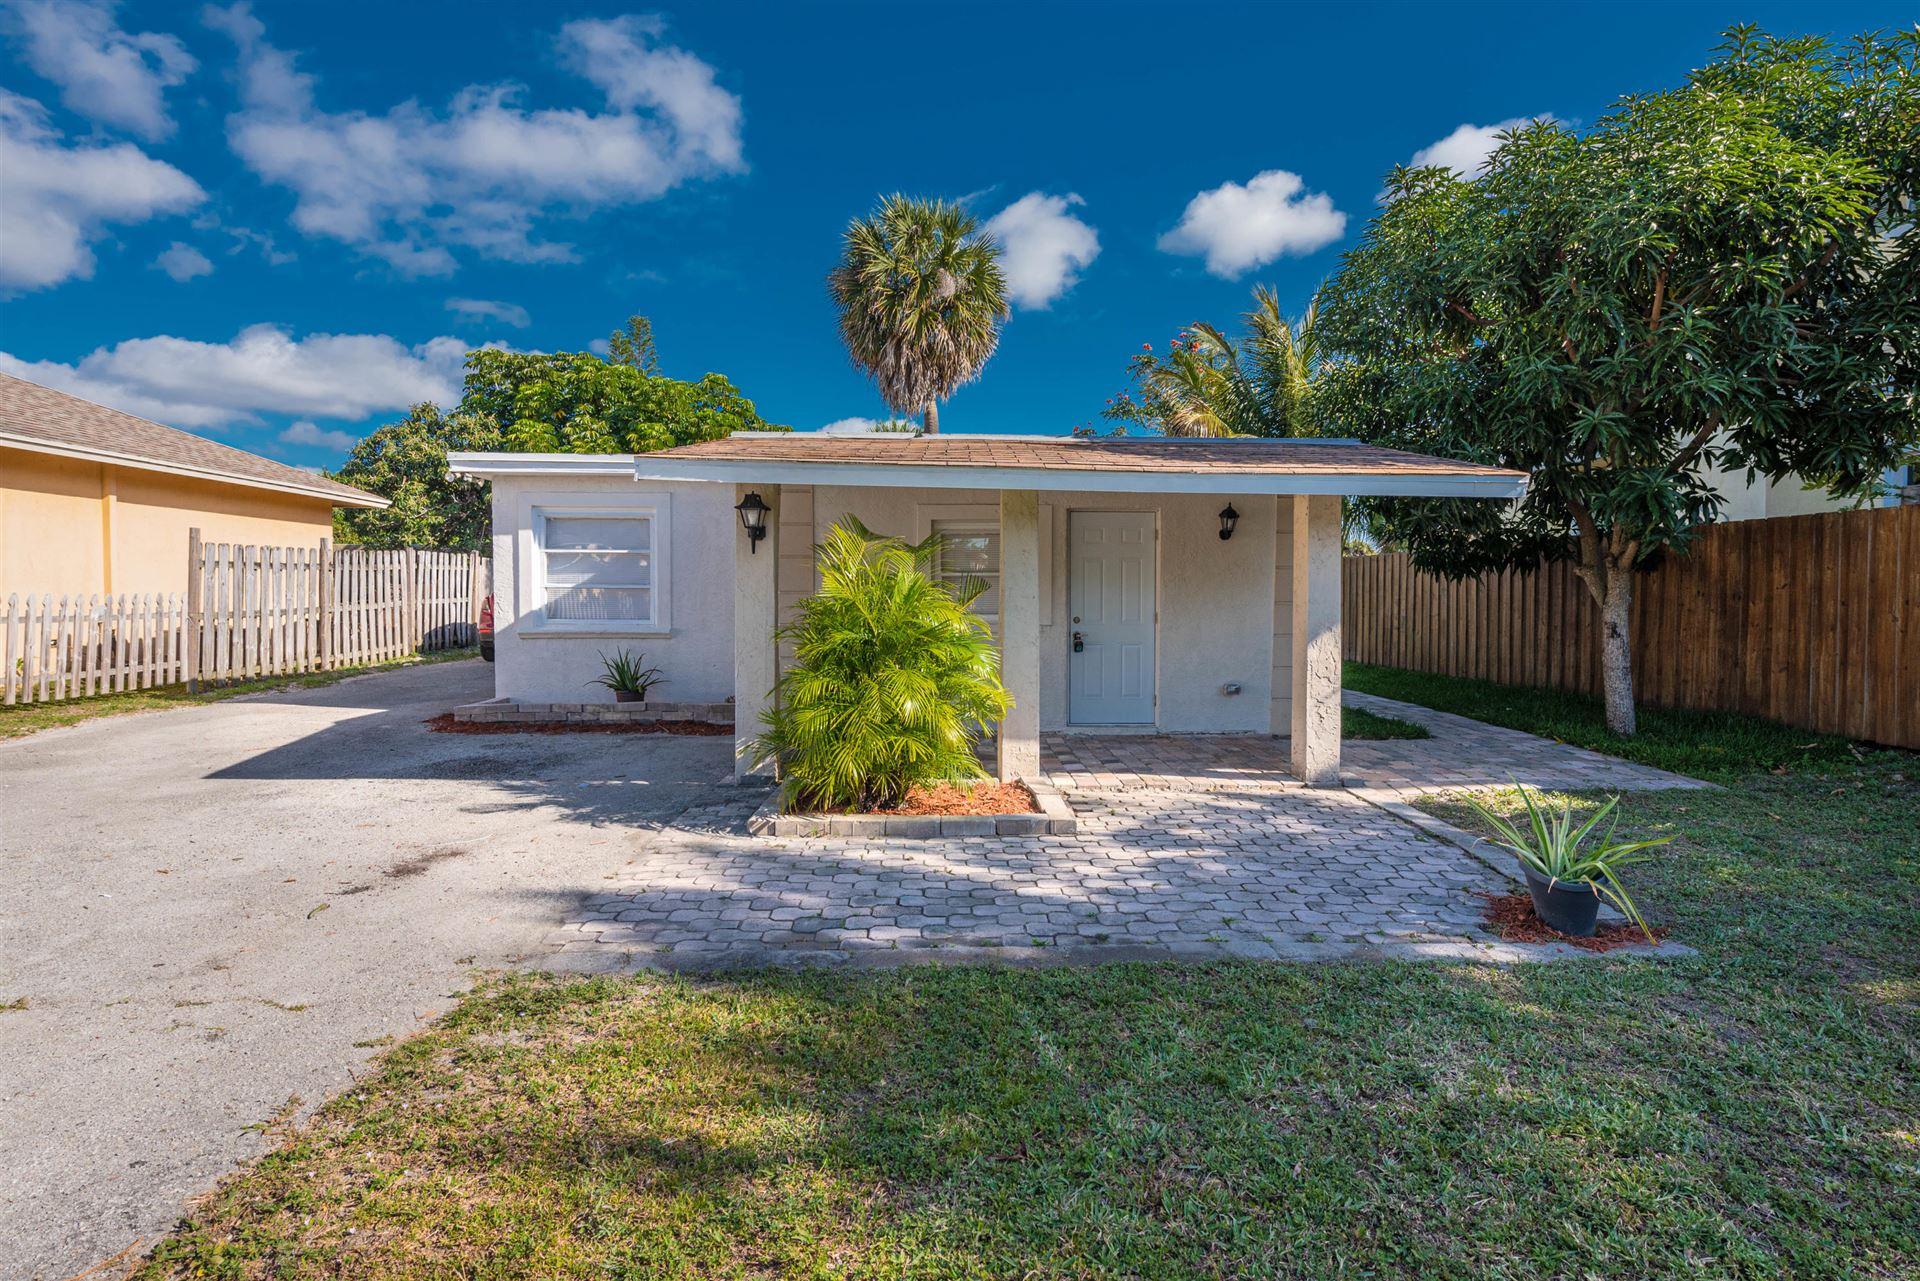 2803 Saranac Avenue, West Palm Beach, FL 33409 - #: RX-10610982